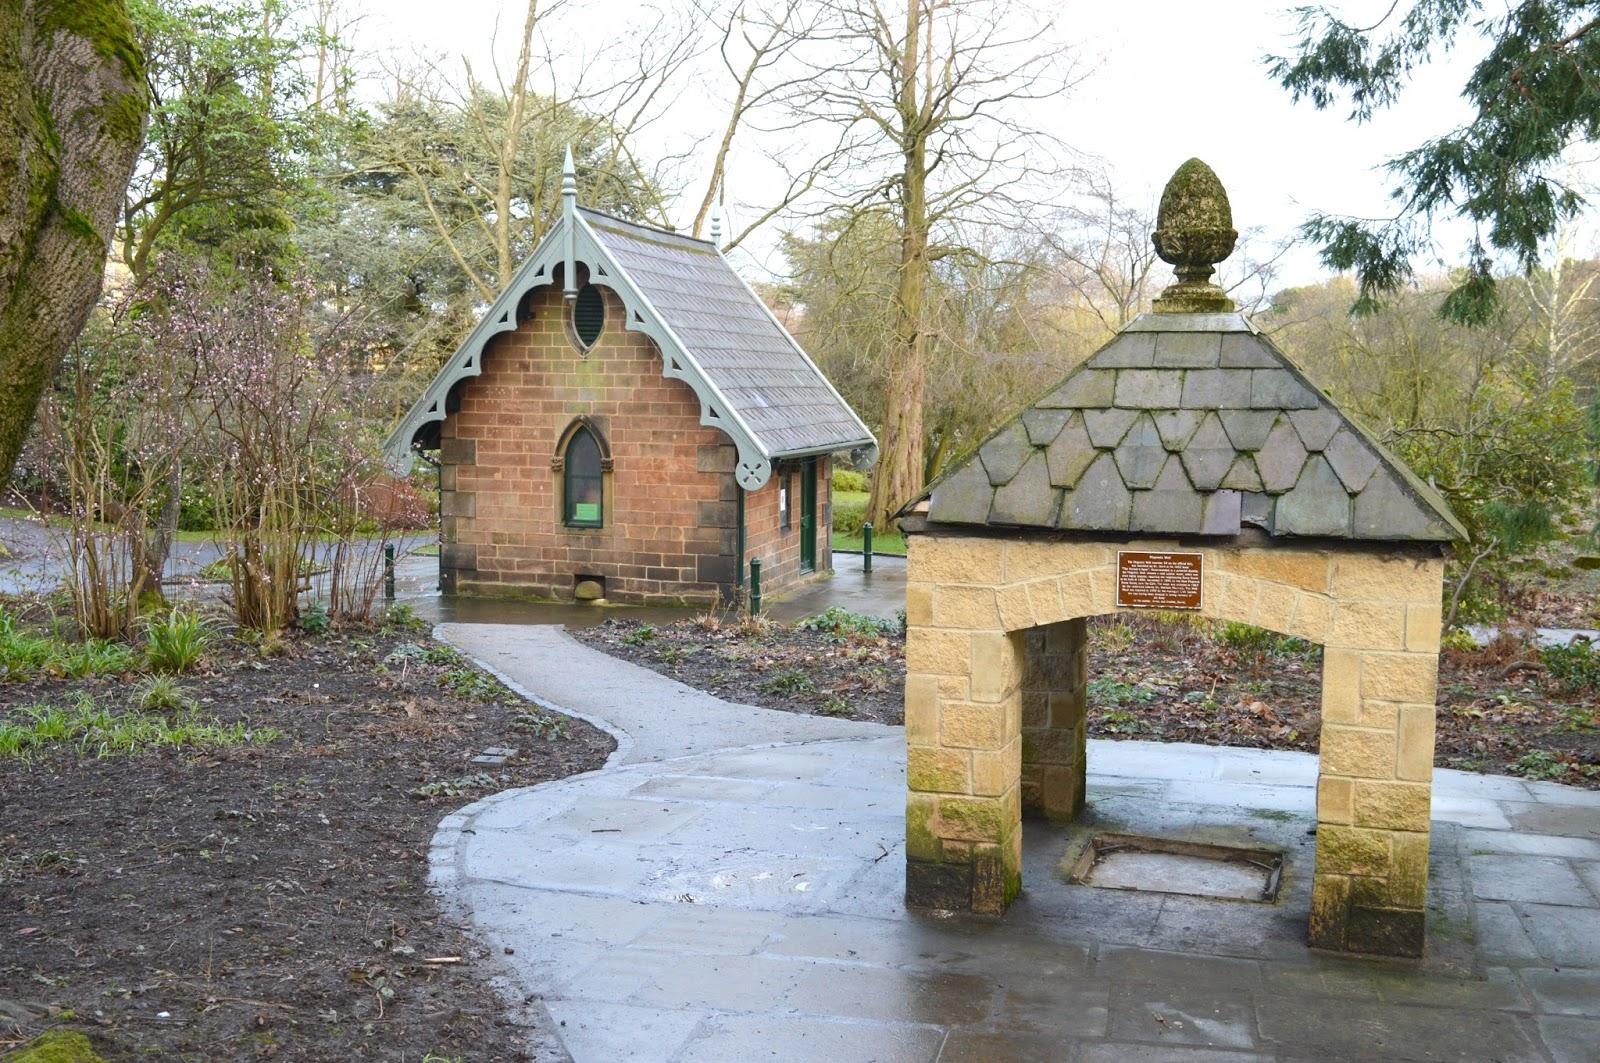 A Weekend in Harrogate - Valley Gardens Old Magneisa Pump House